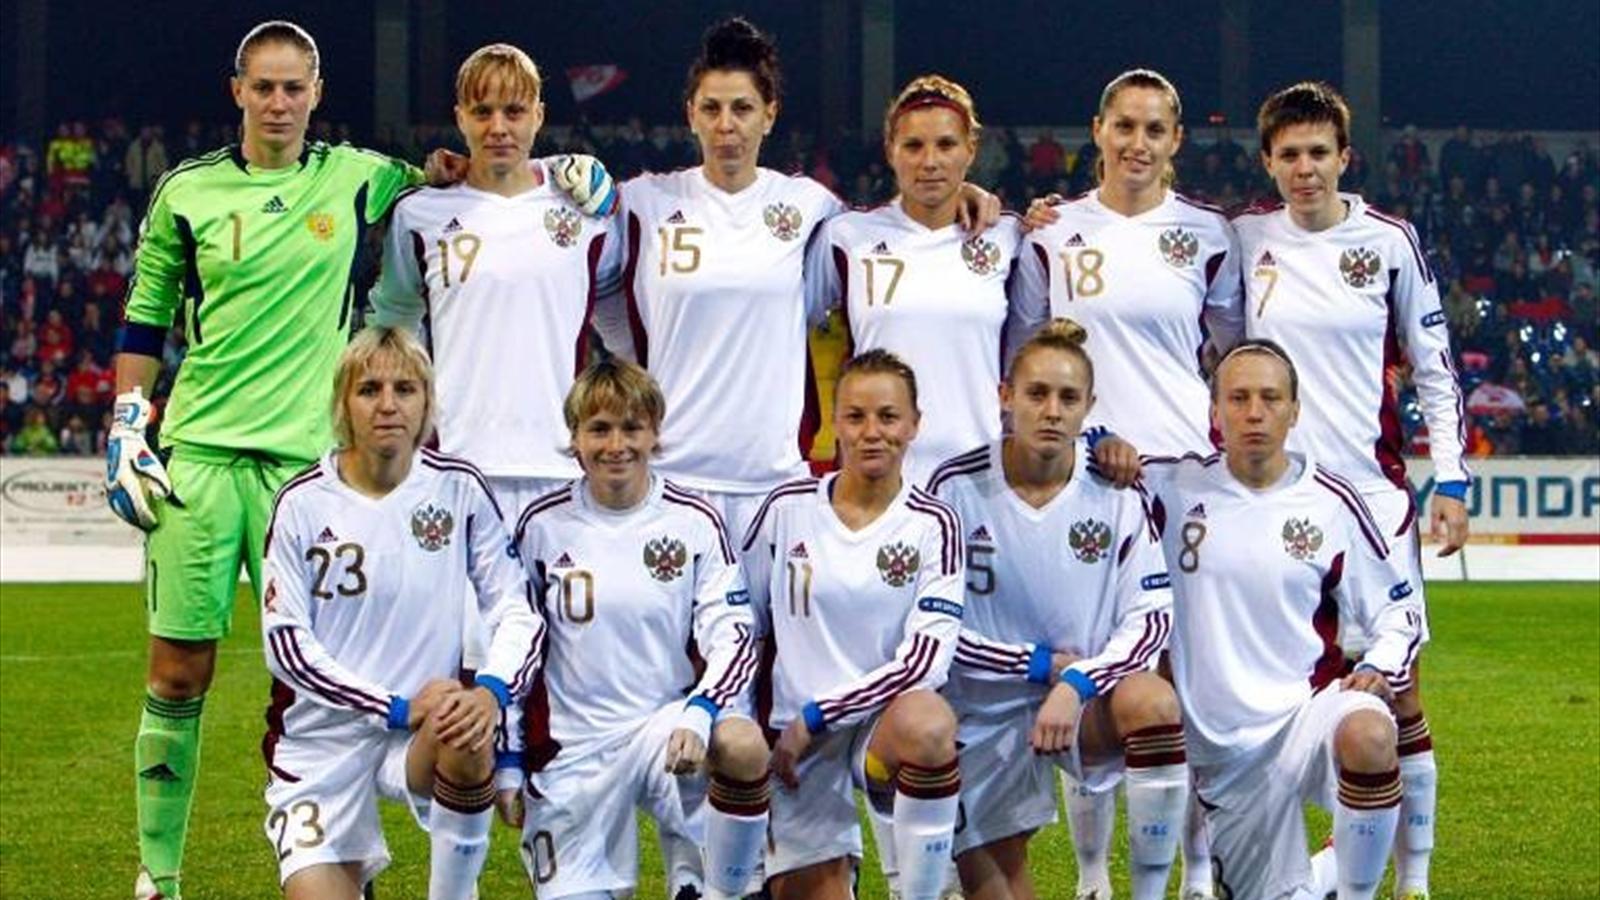 Euro 2013 groupe c la russie le petit poucet football f minin 2013 football eurosport - Coupe d europe de basket feminin ...